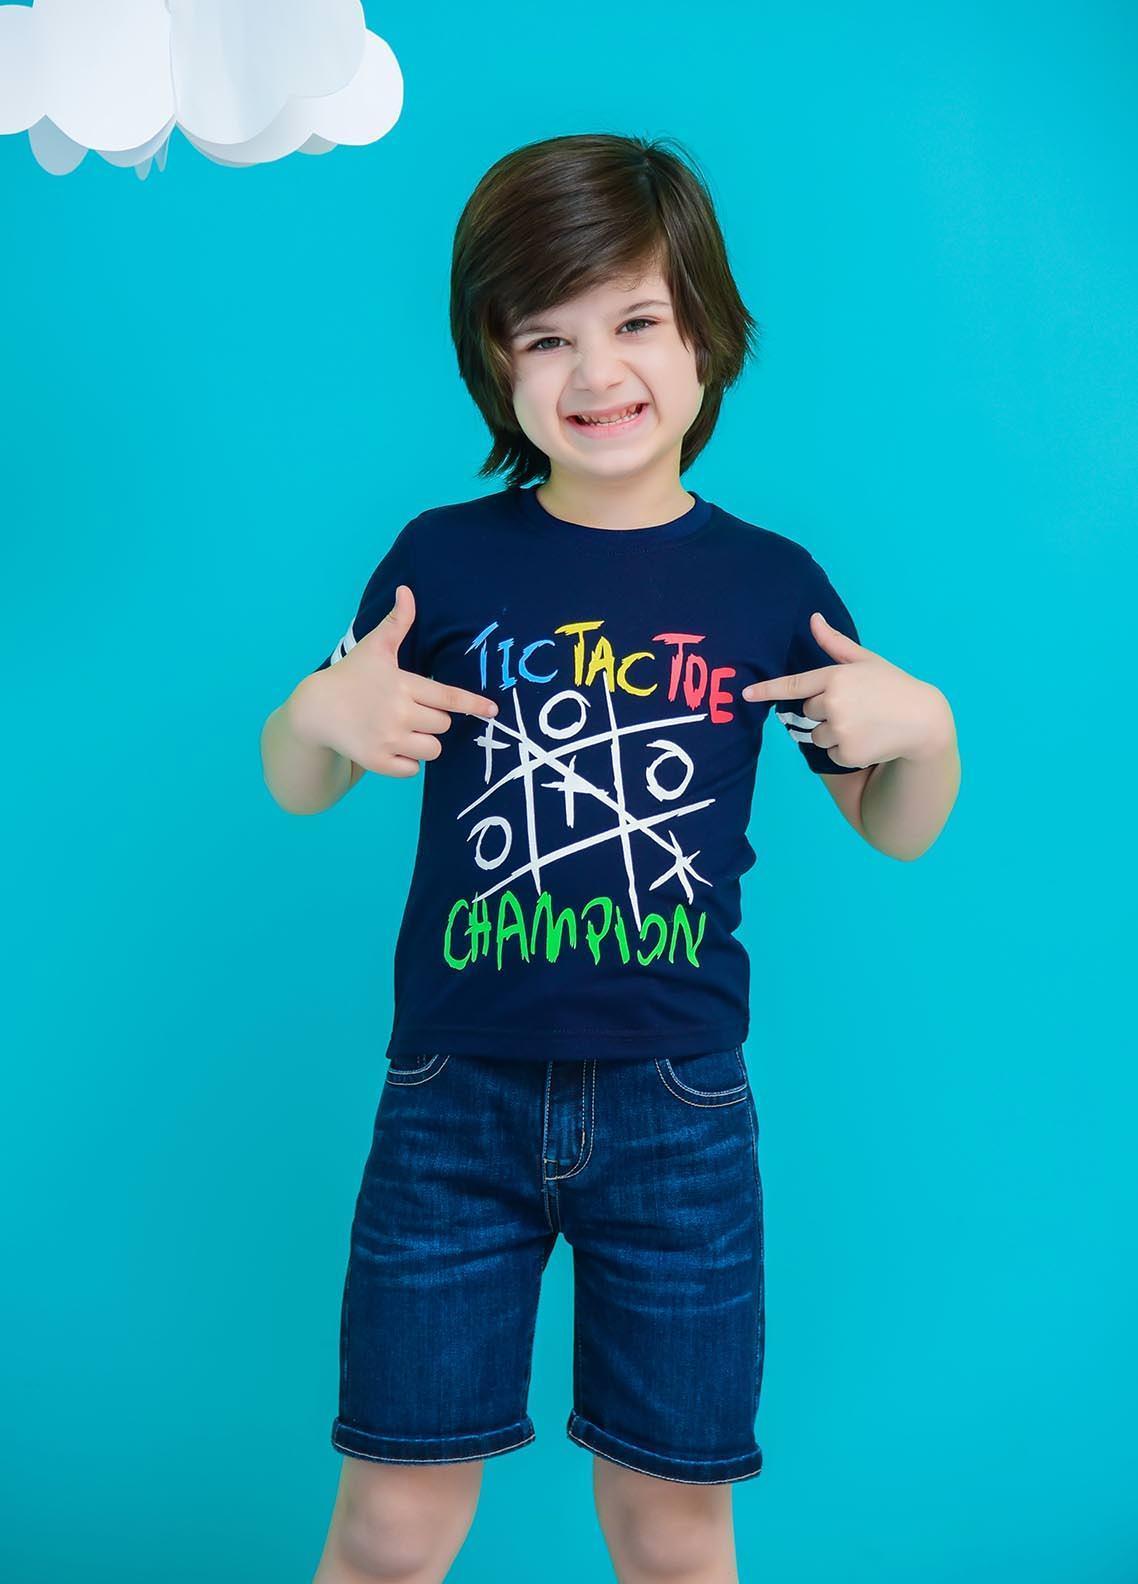 Ochre Cotton  T-Shirt for Boys -  OKB-81 Navy